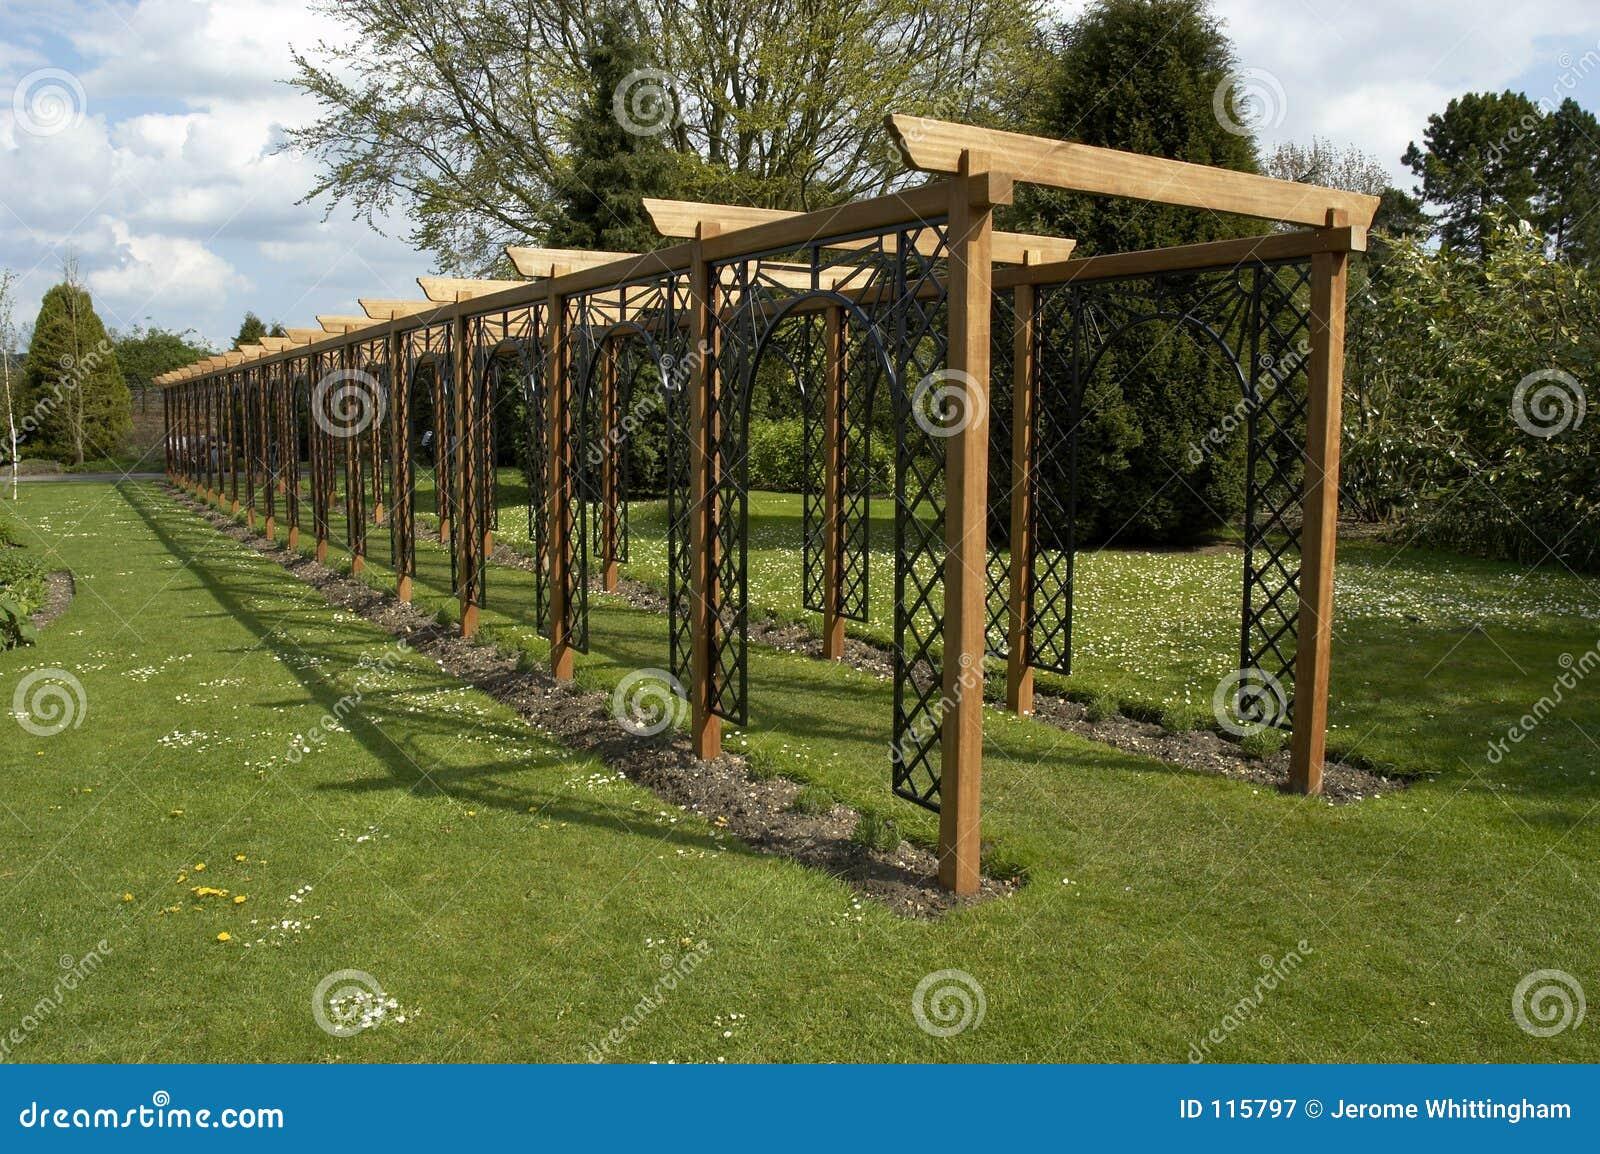 Pergola royalty free stock photography image 115797 for Metal garden bridge designs